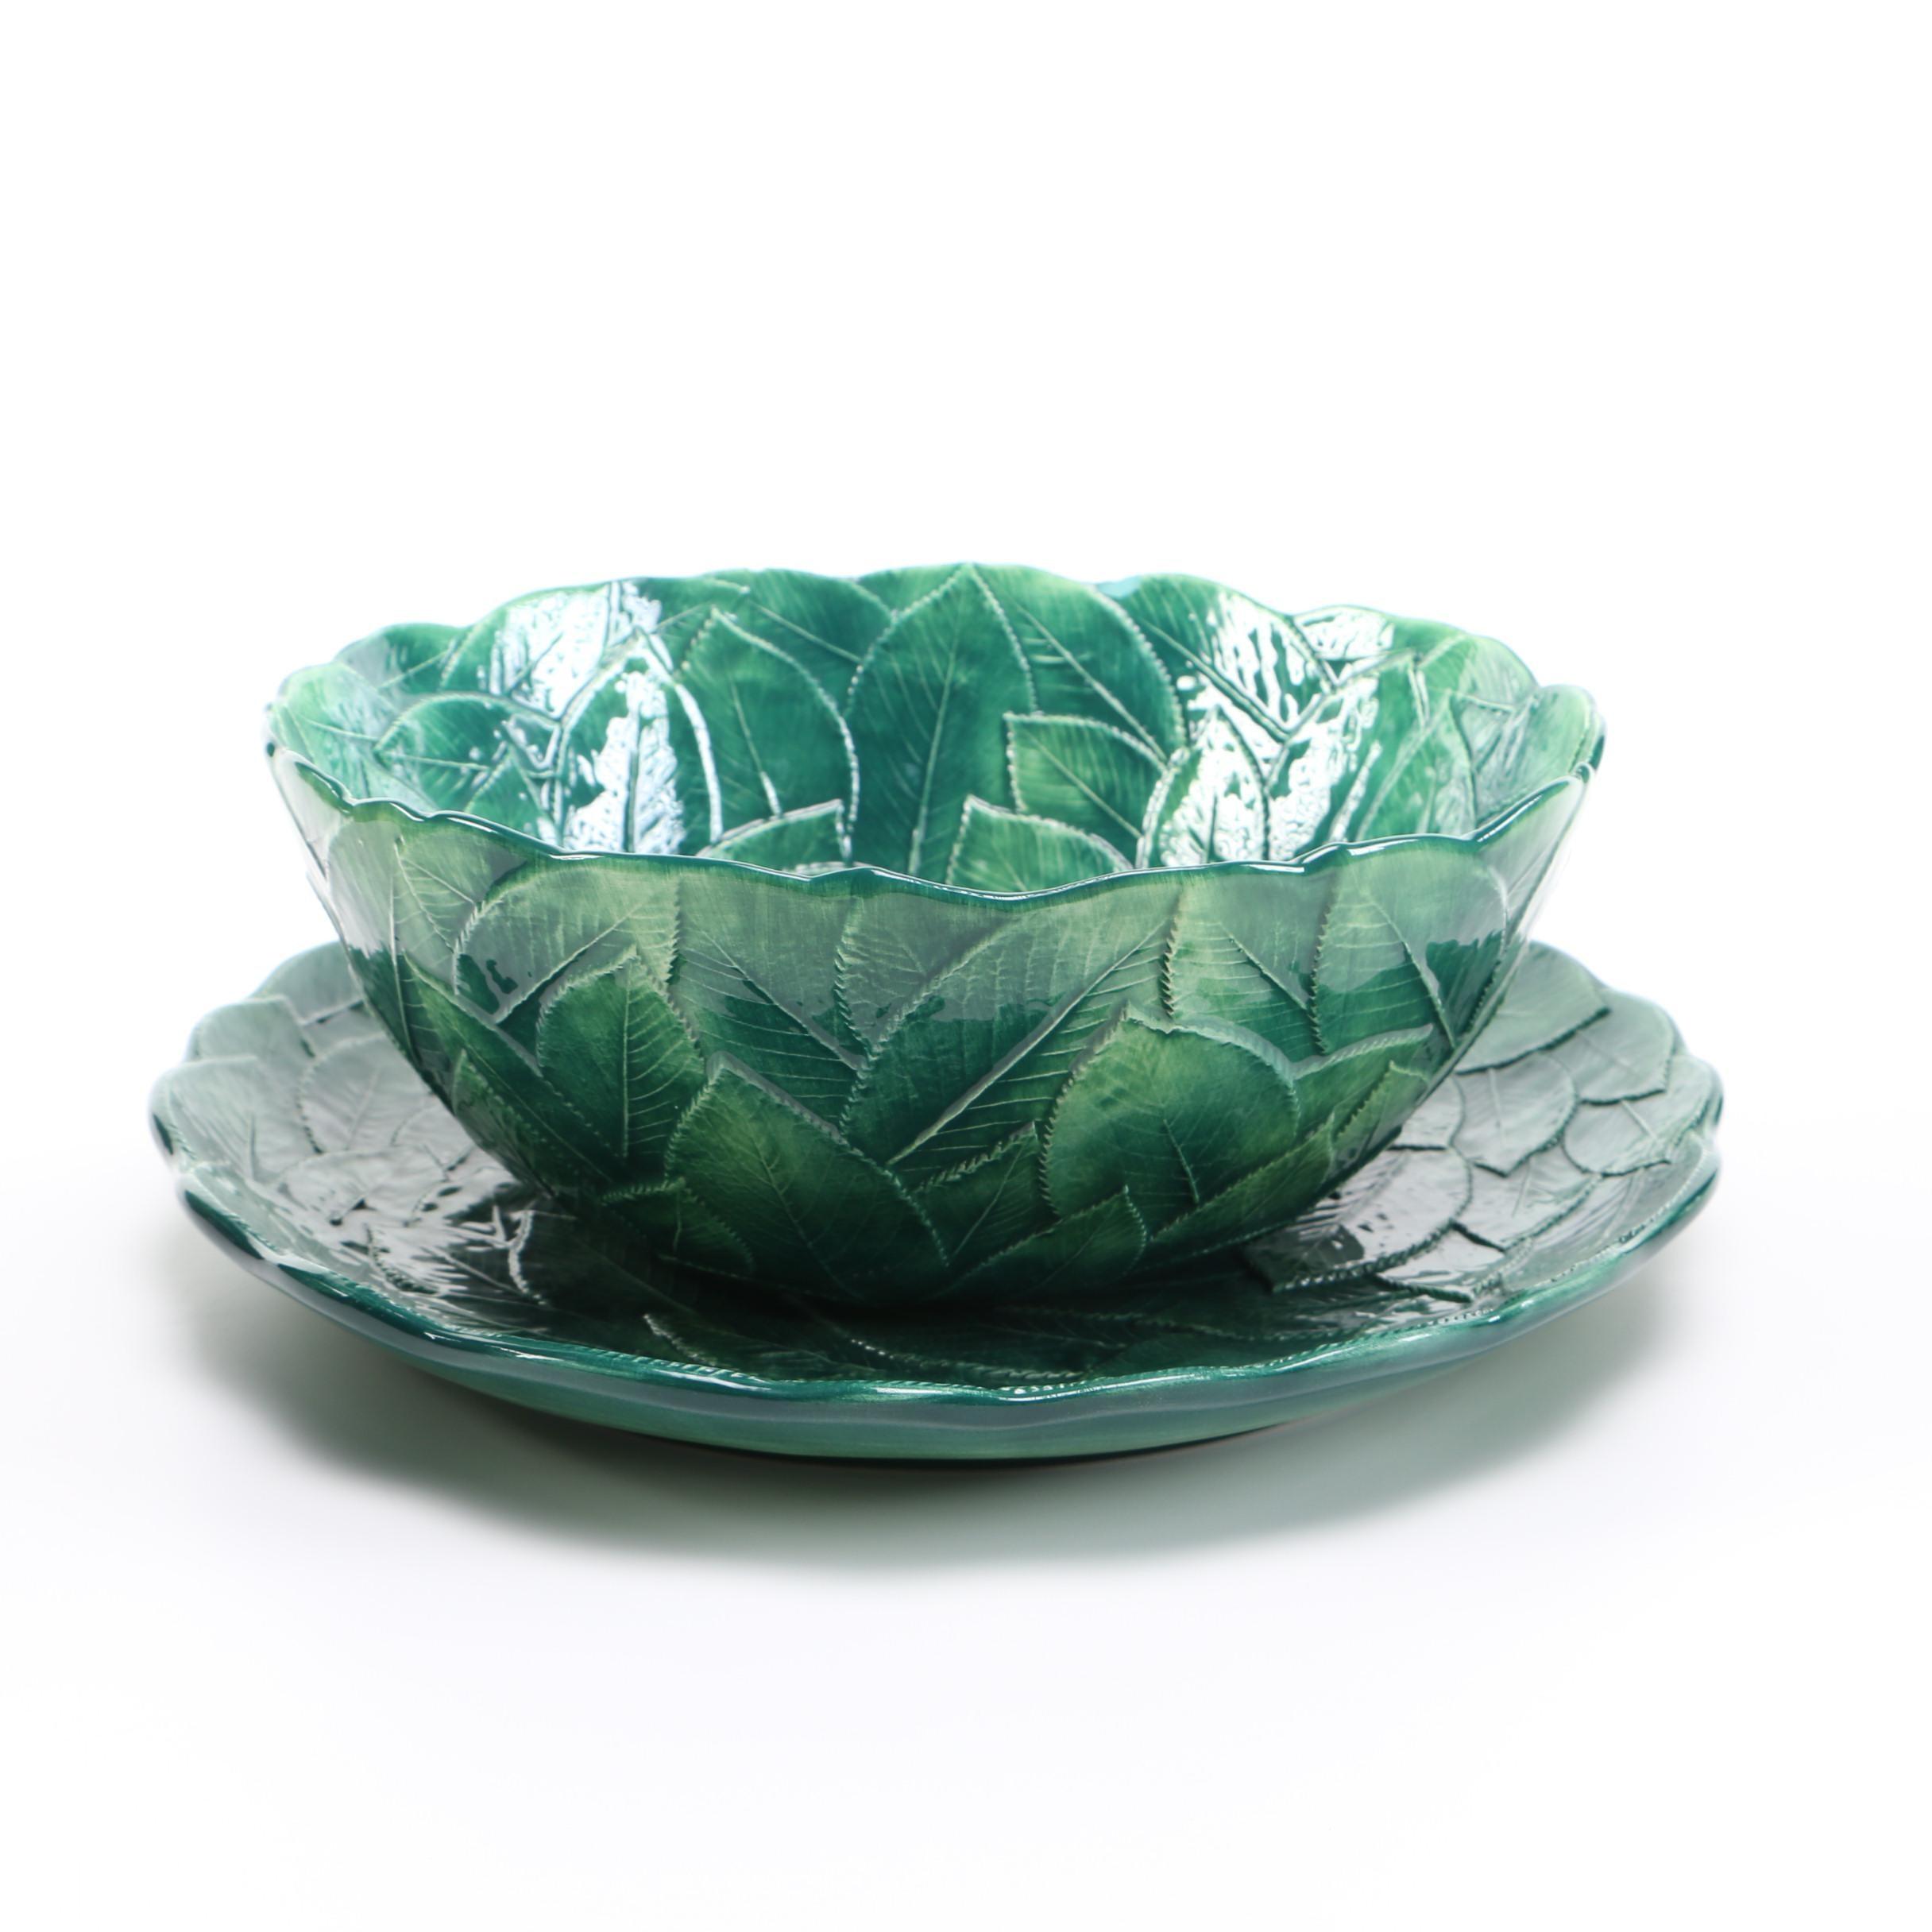 Italian Majolica Ceramic Leaf Bowl and Serving Plate